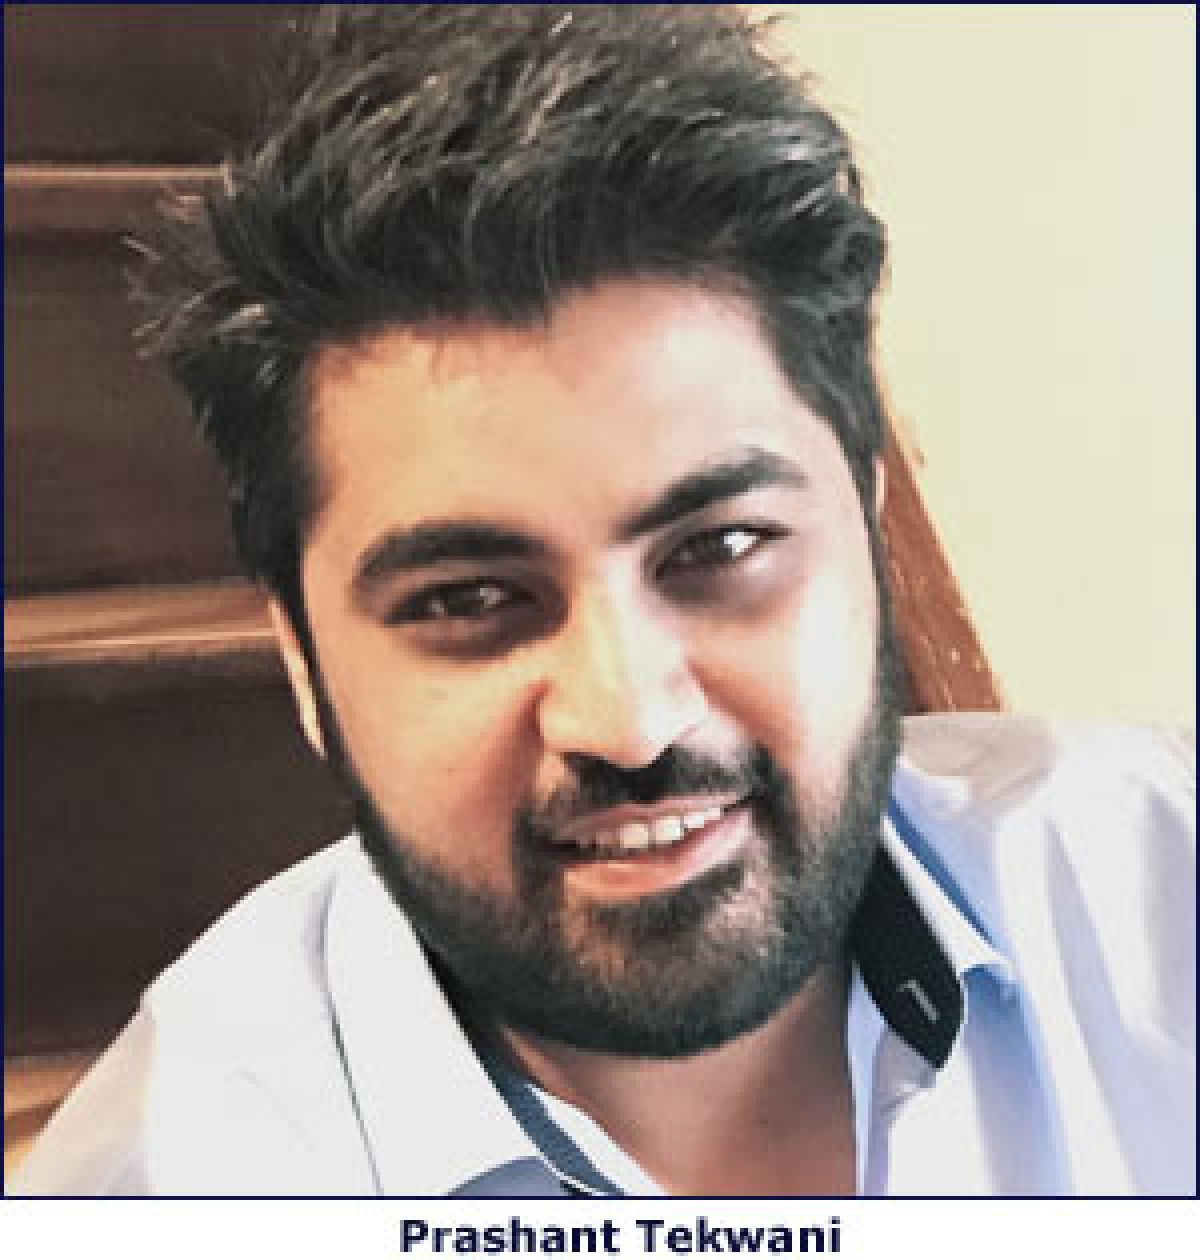 iContract's Prashant Tekwani joins Monk Media Network